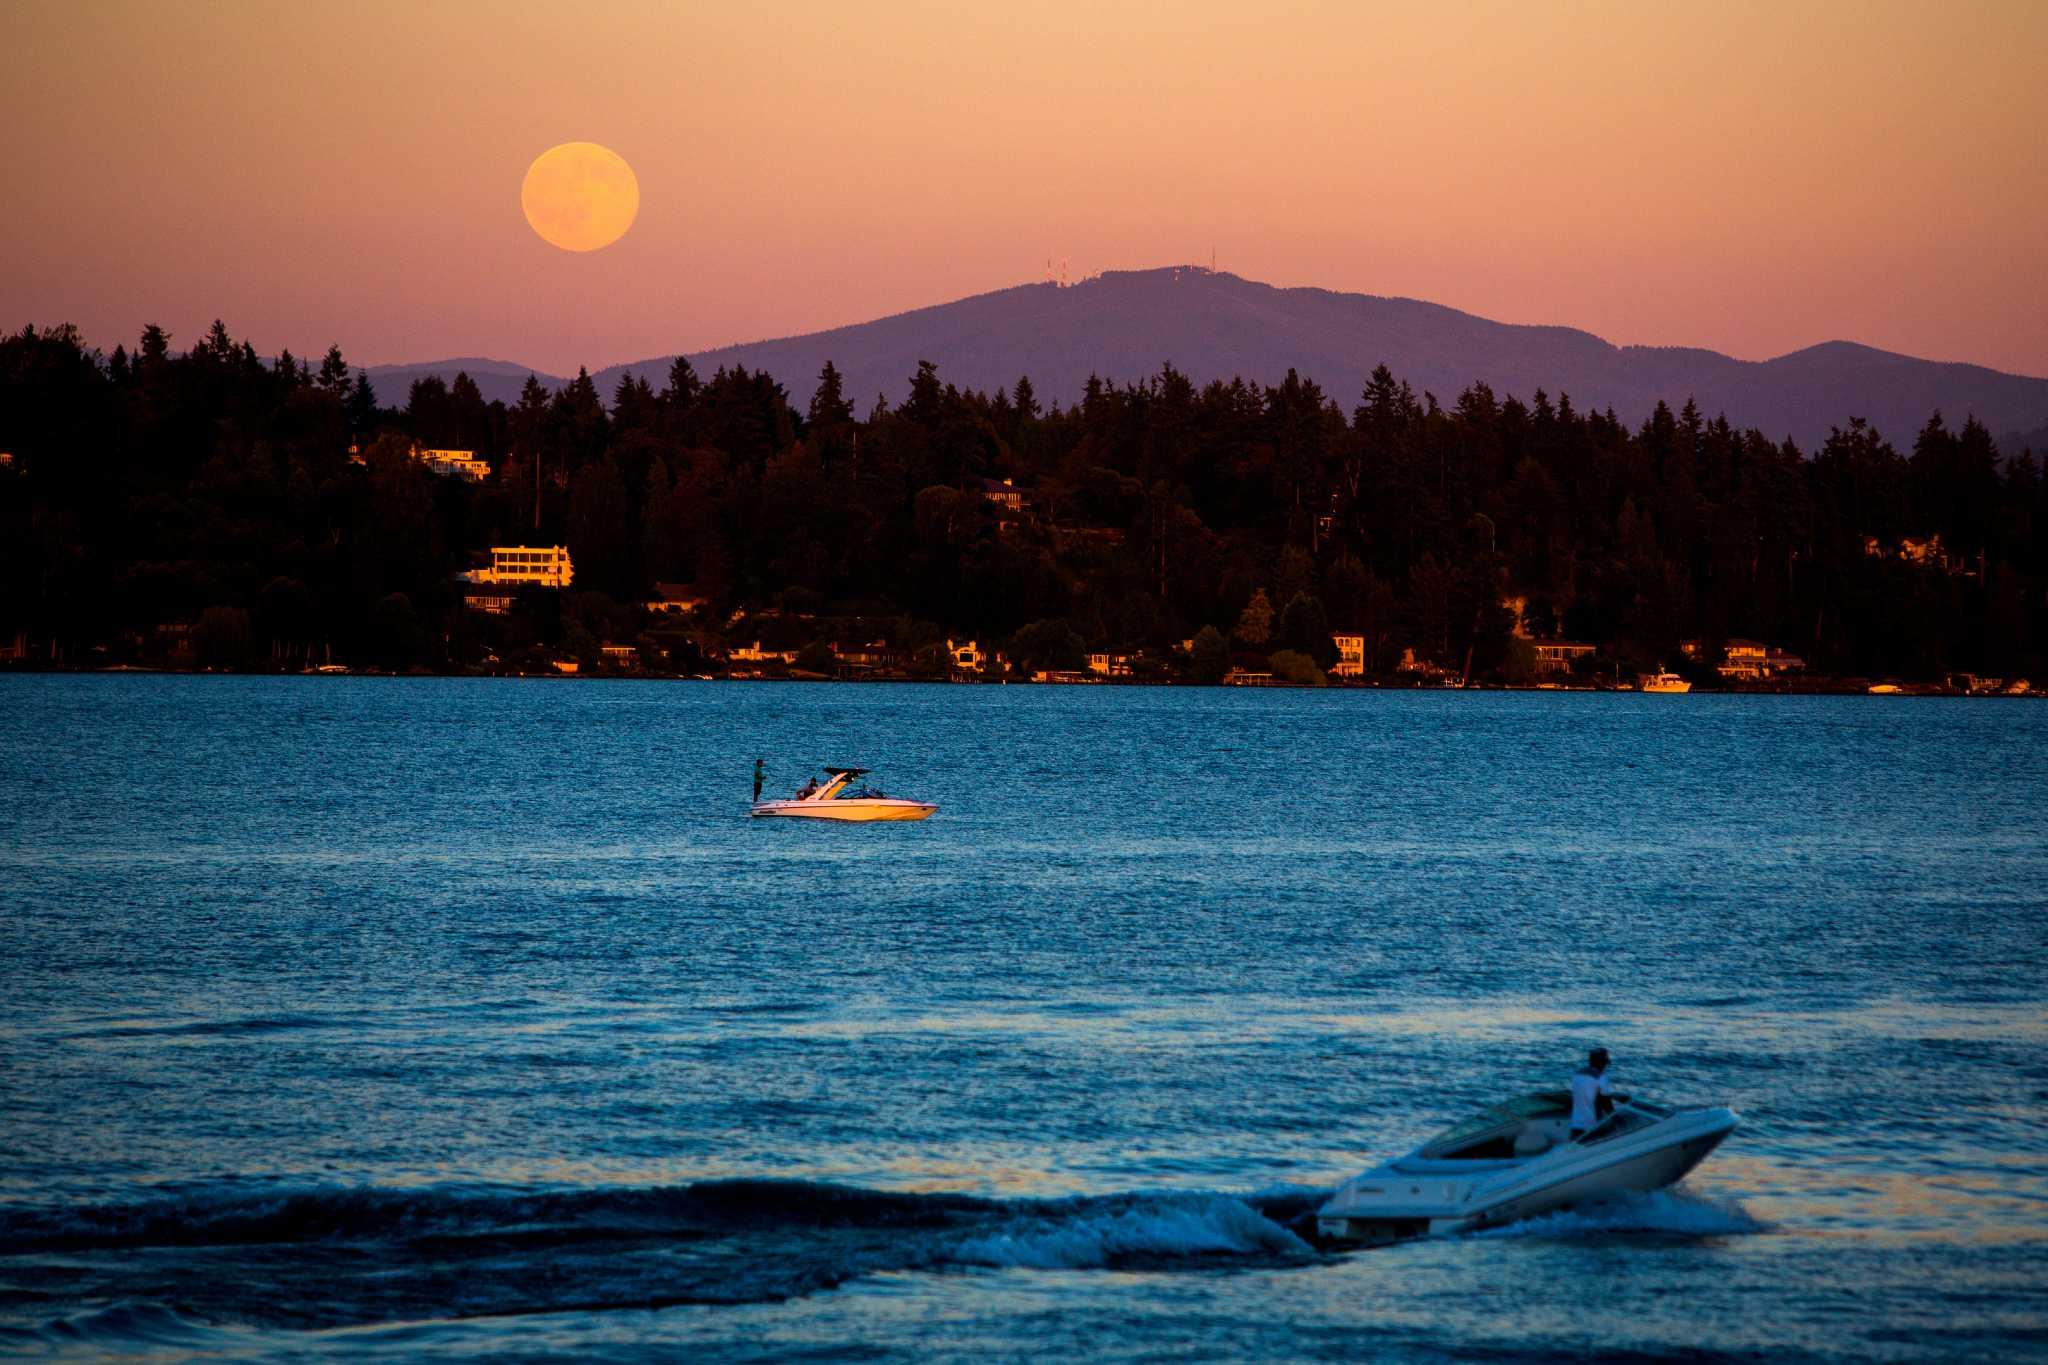 Celestial trifecta: 'Micro' Harvest full moon set for Friday the 13th